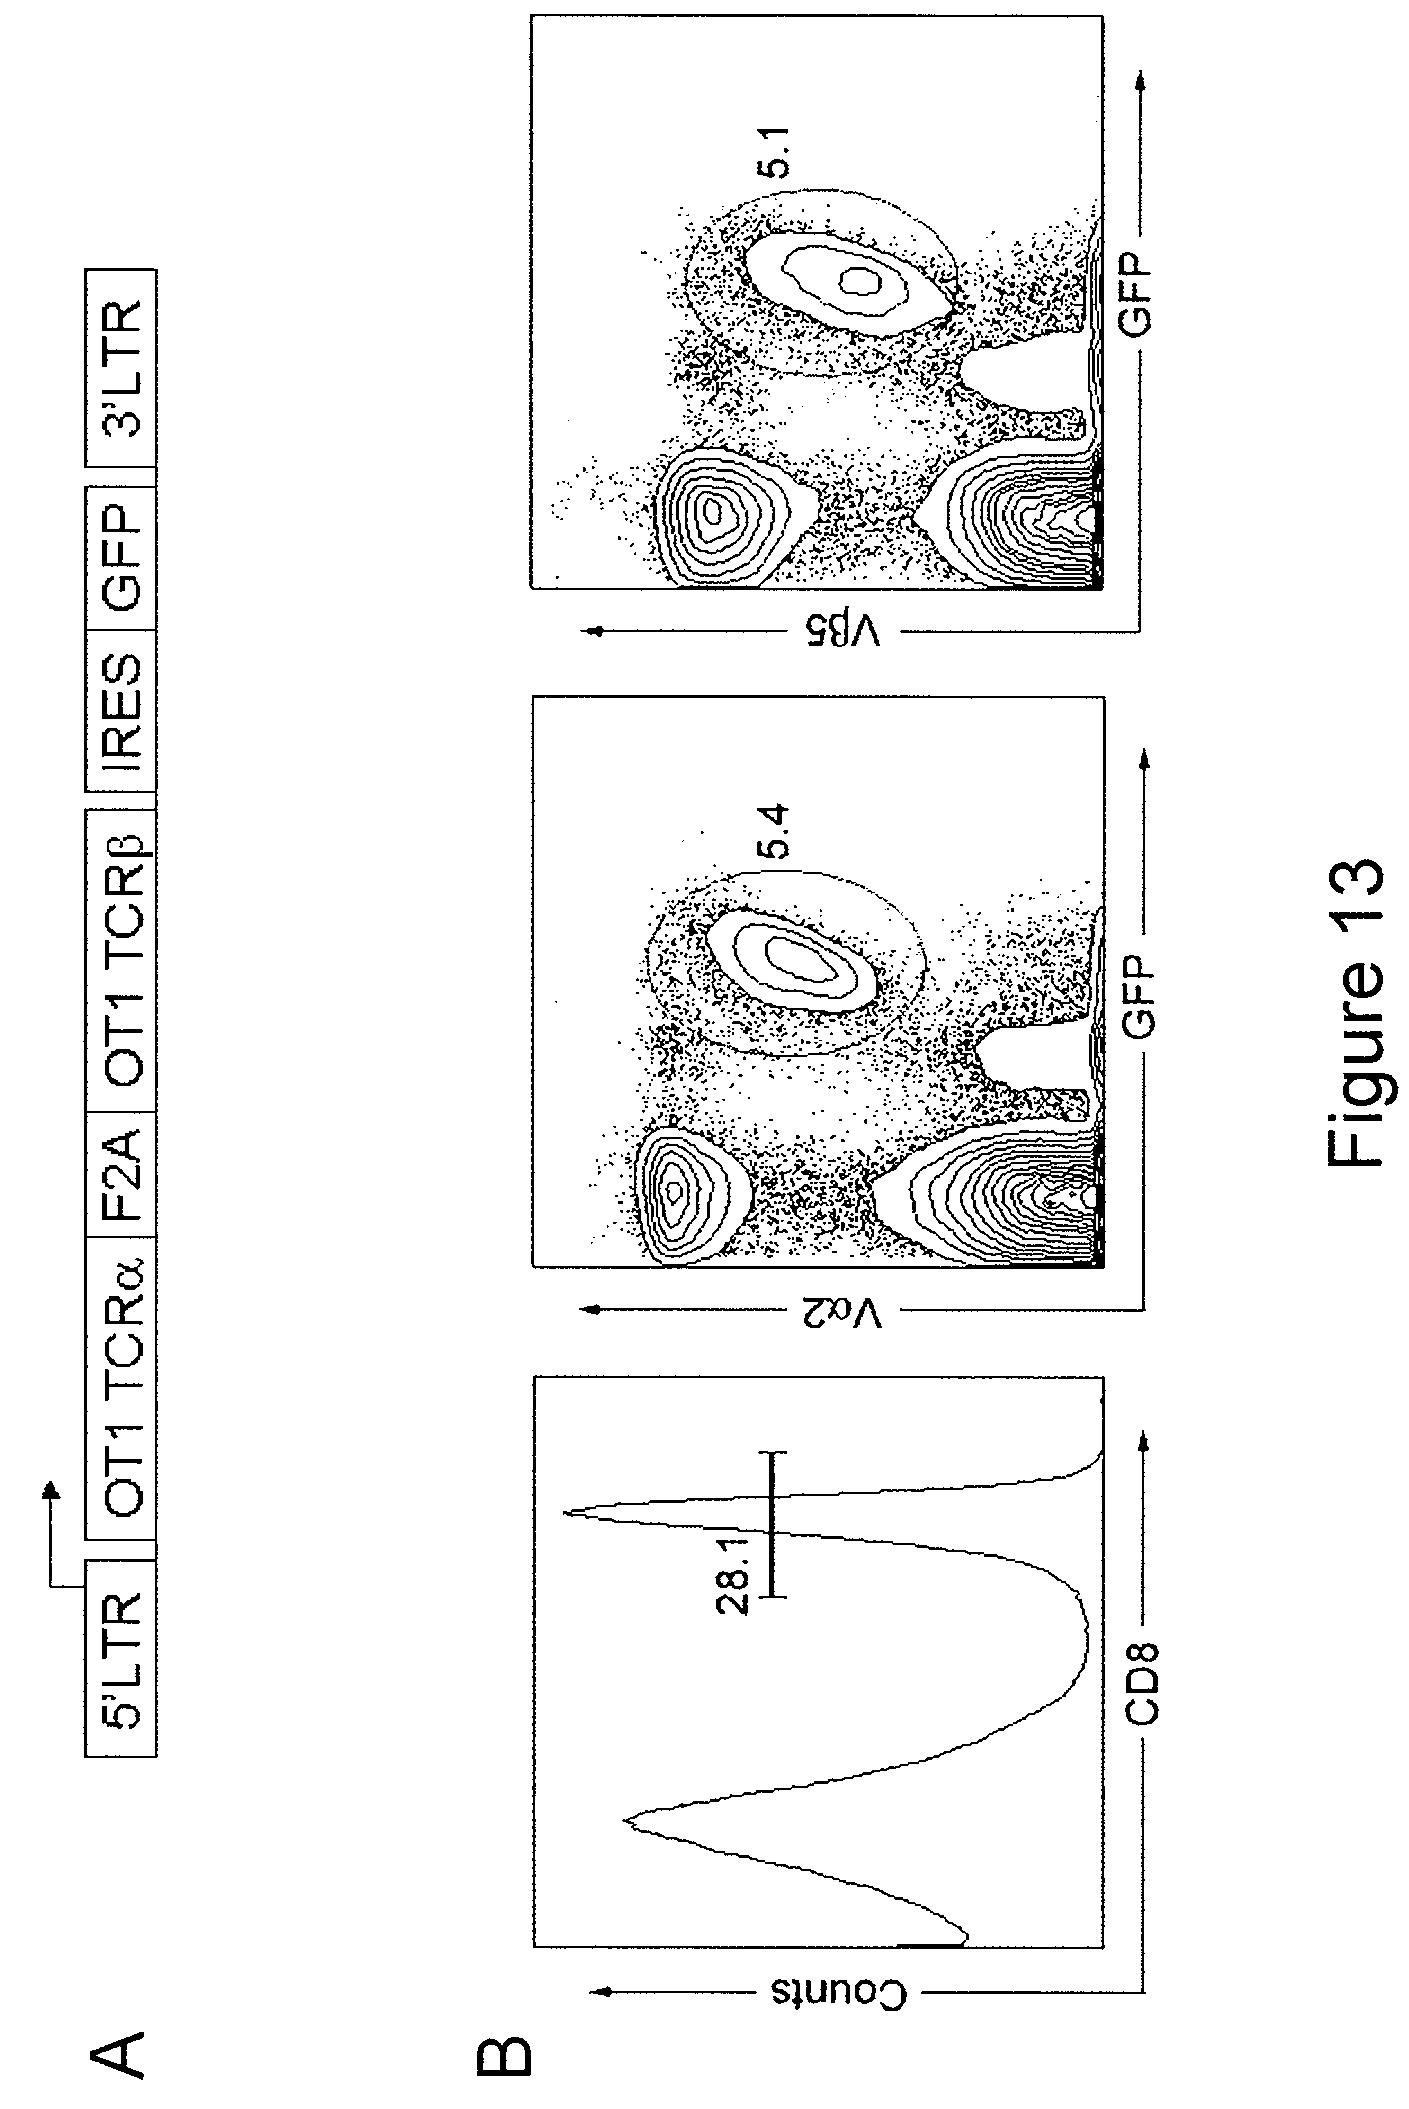 farmall b wiring diagram wiring diagram and schematic design farmall b wiring diagram nest